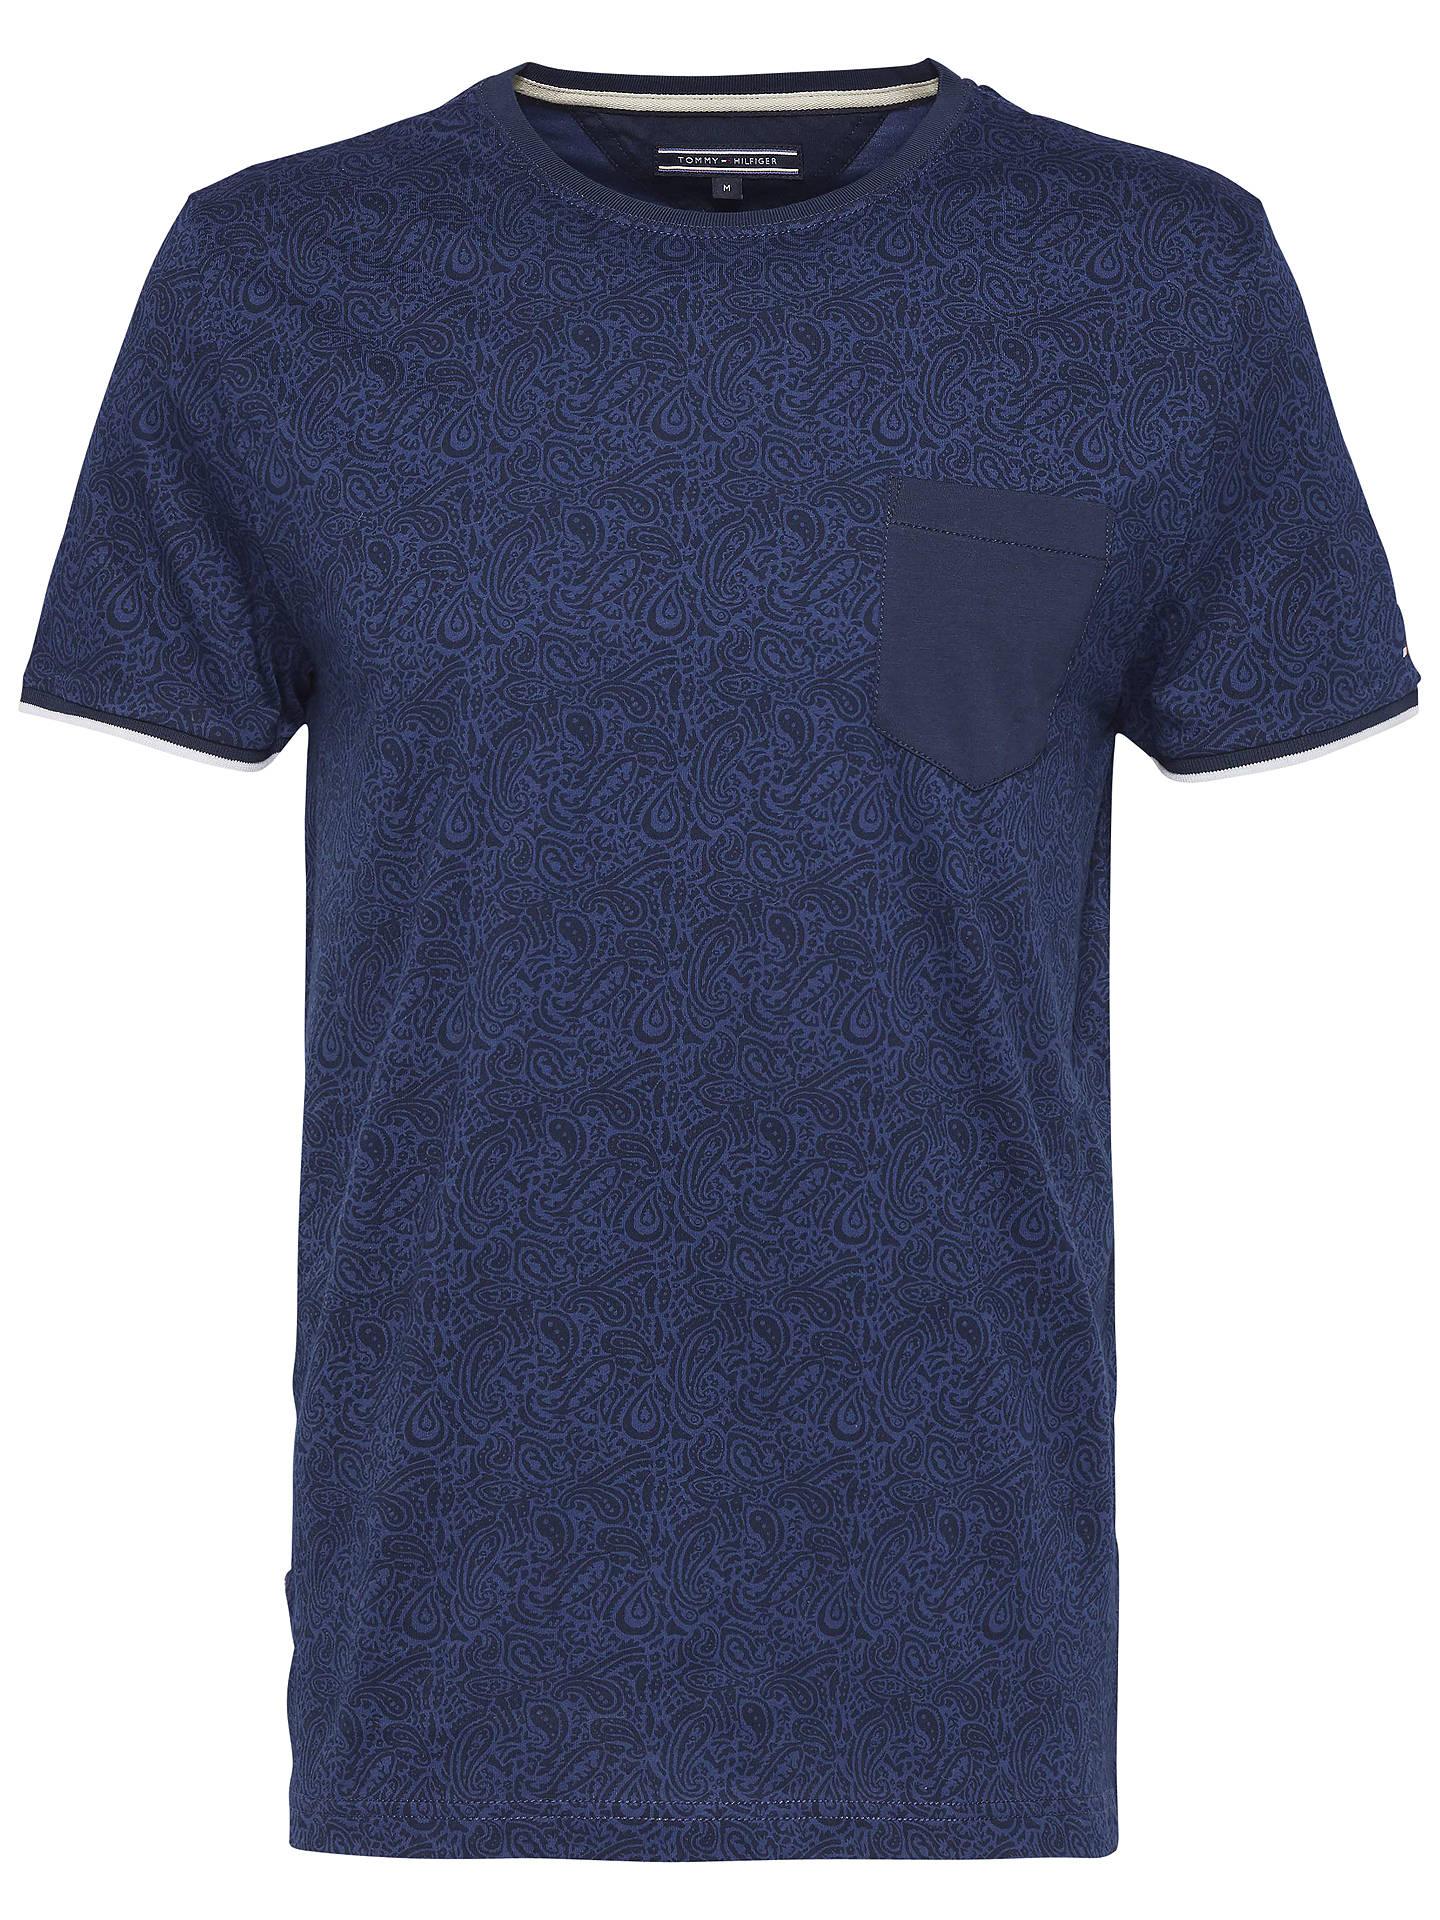 8484e70435267e BuyTommy Hilfiger Tyson Paisley Print T-Shirt